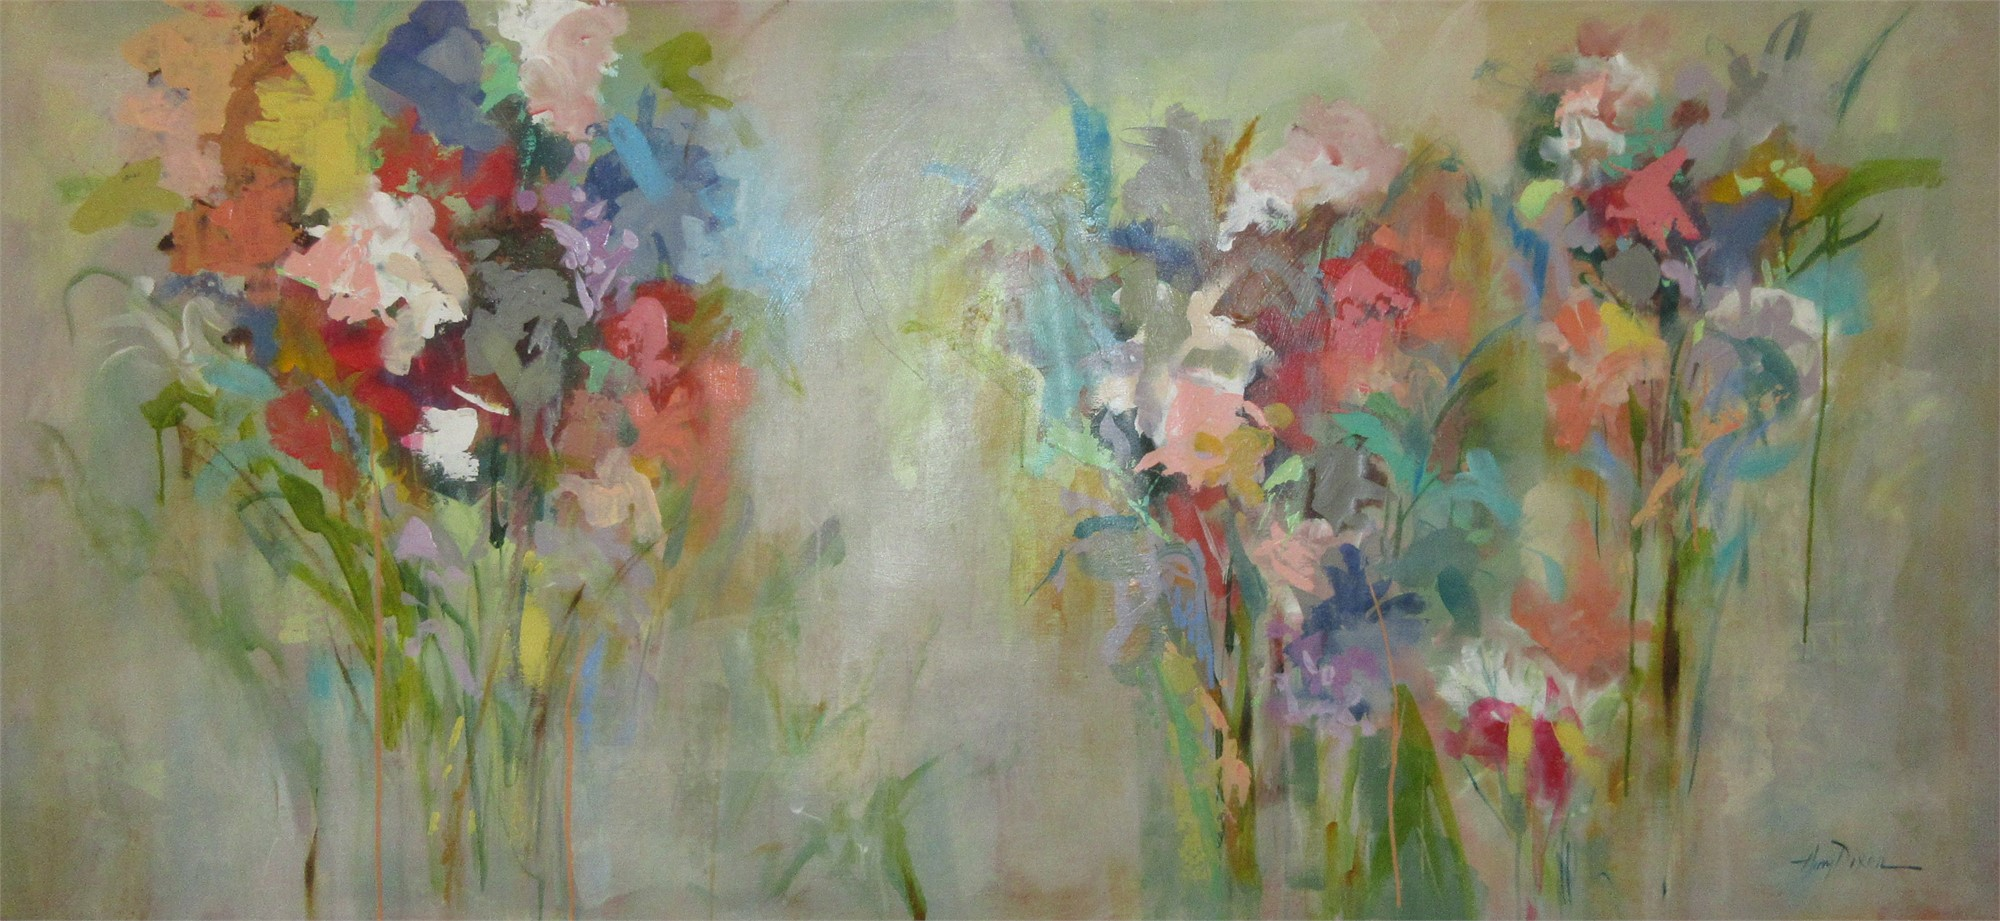 Sweet Dreams by Amy Dixon